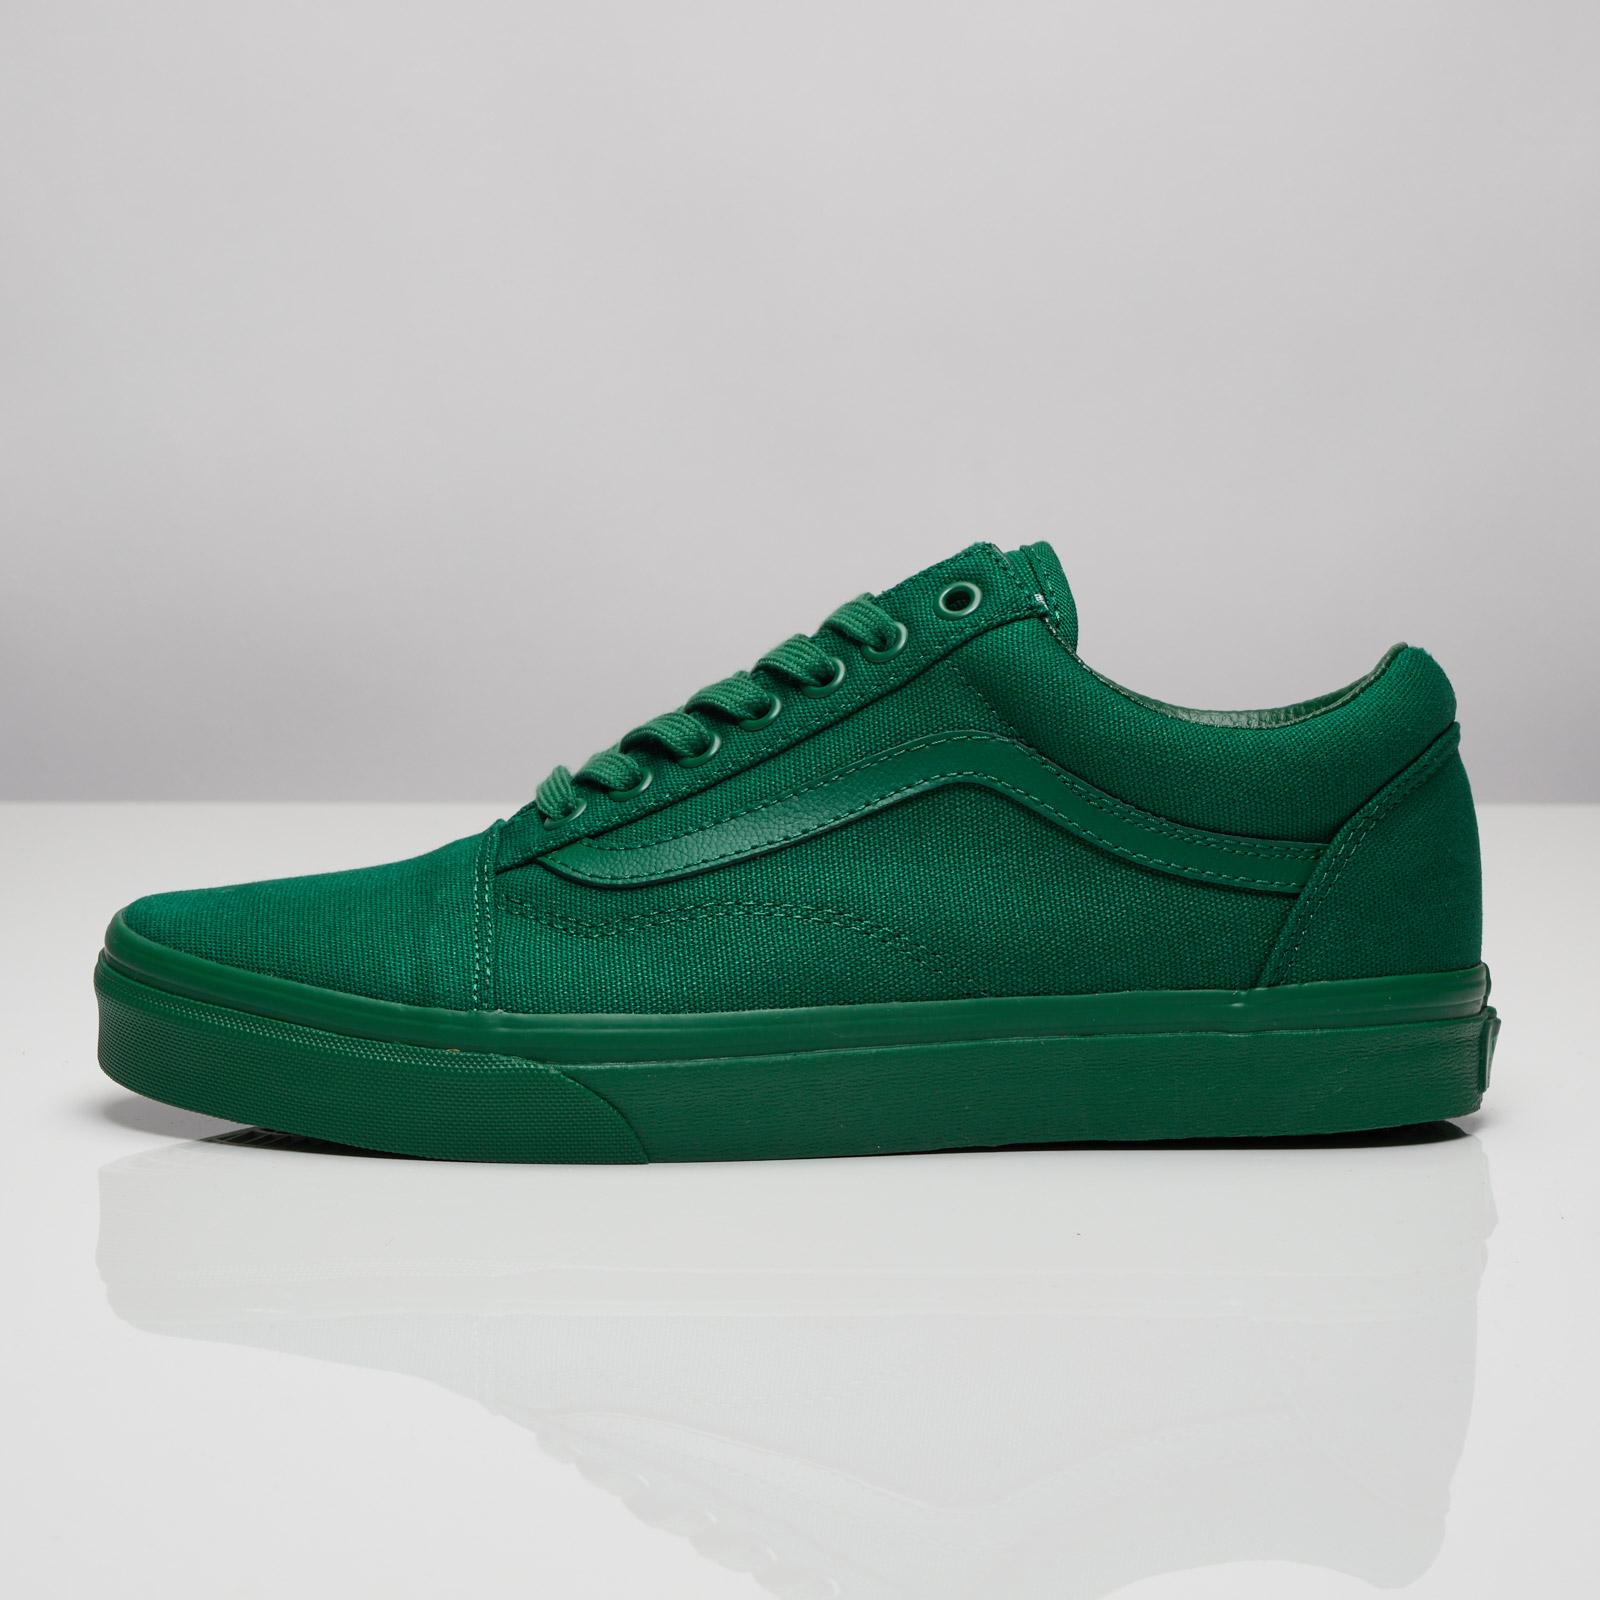 5137be9068 Vans Old Skool - V4ojj5f - Sneakersnstuff